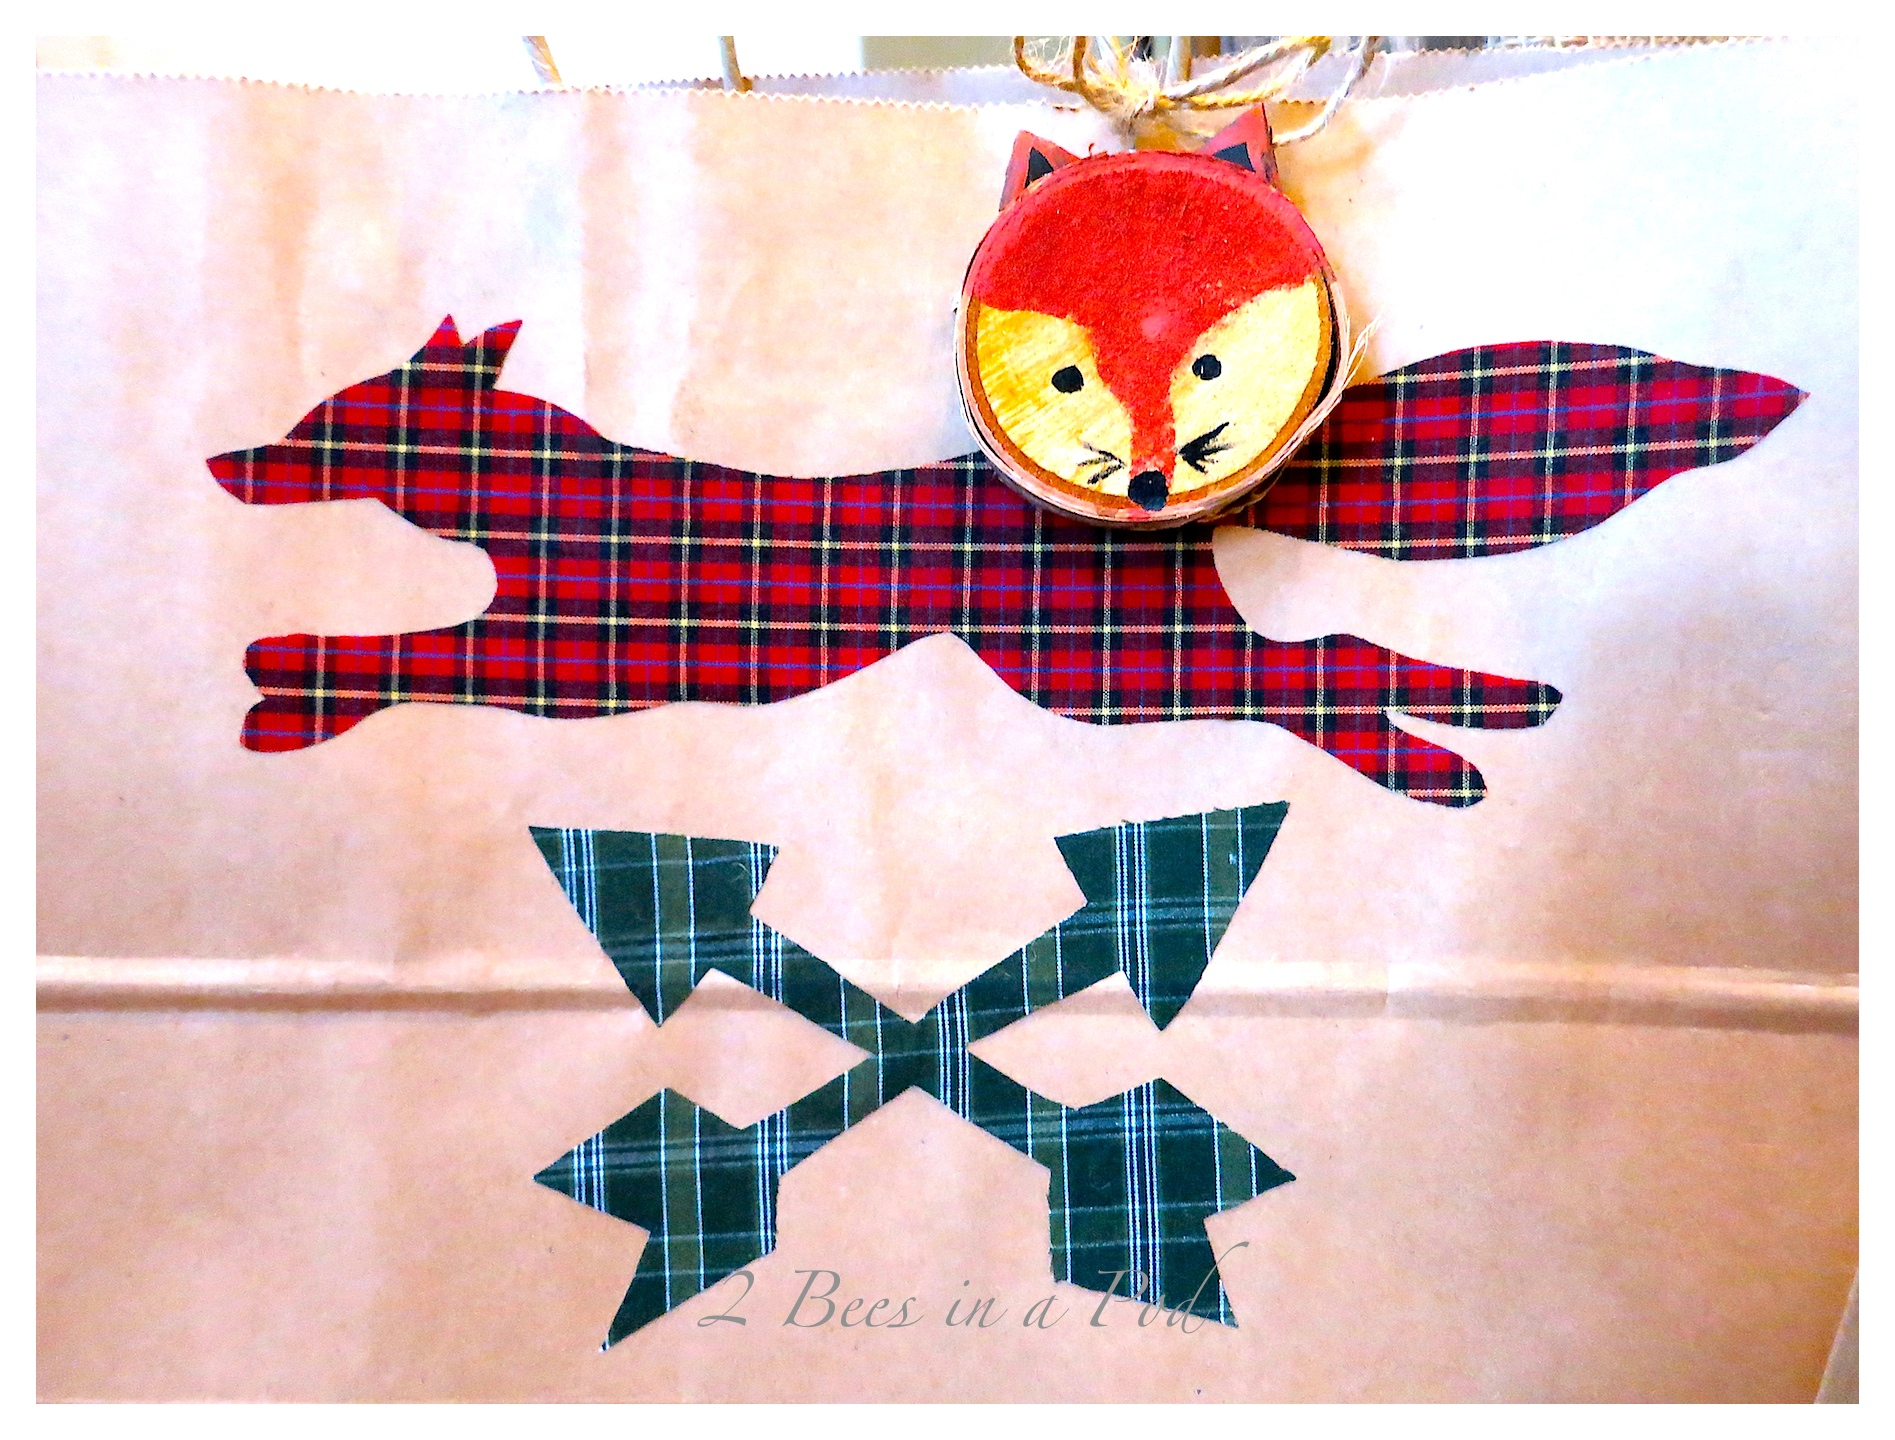 Woodland Fox and Christmas Plaid Gift Wrapping…